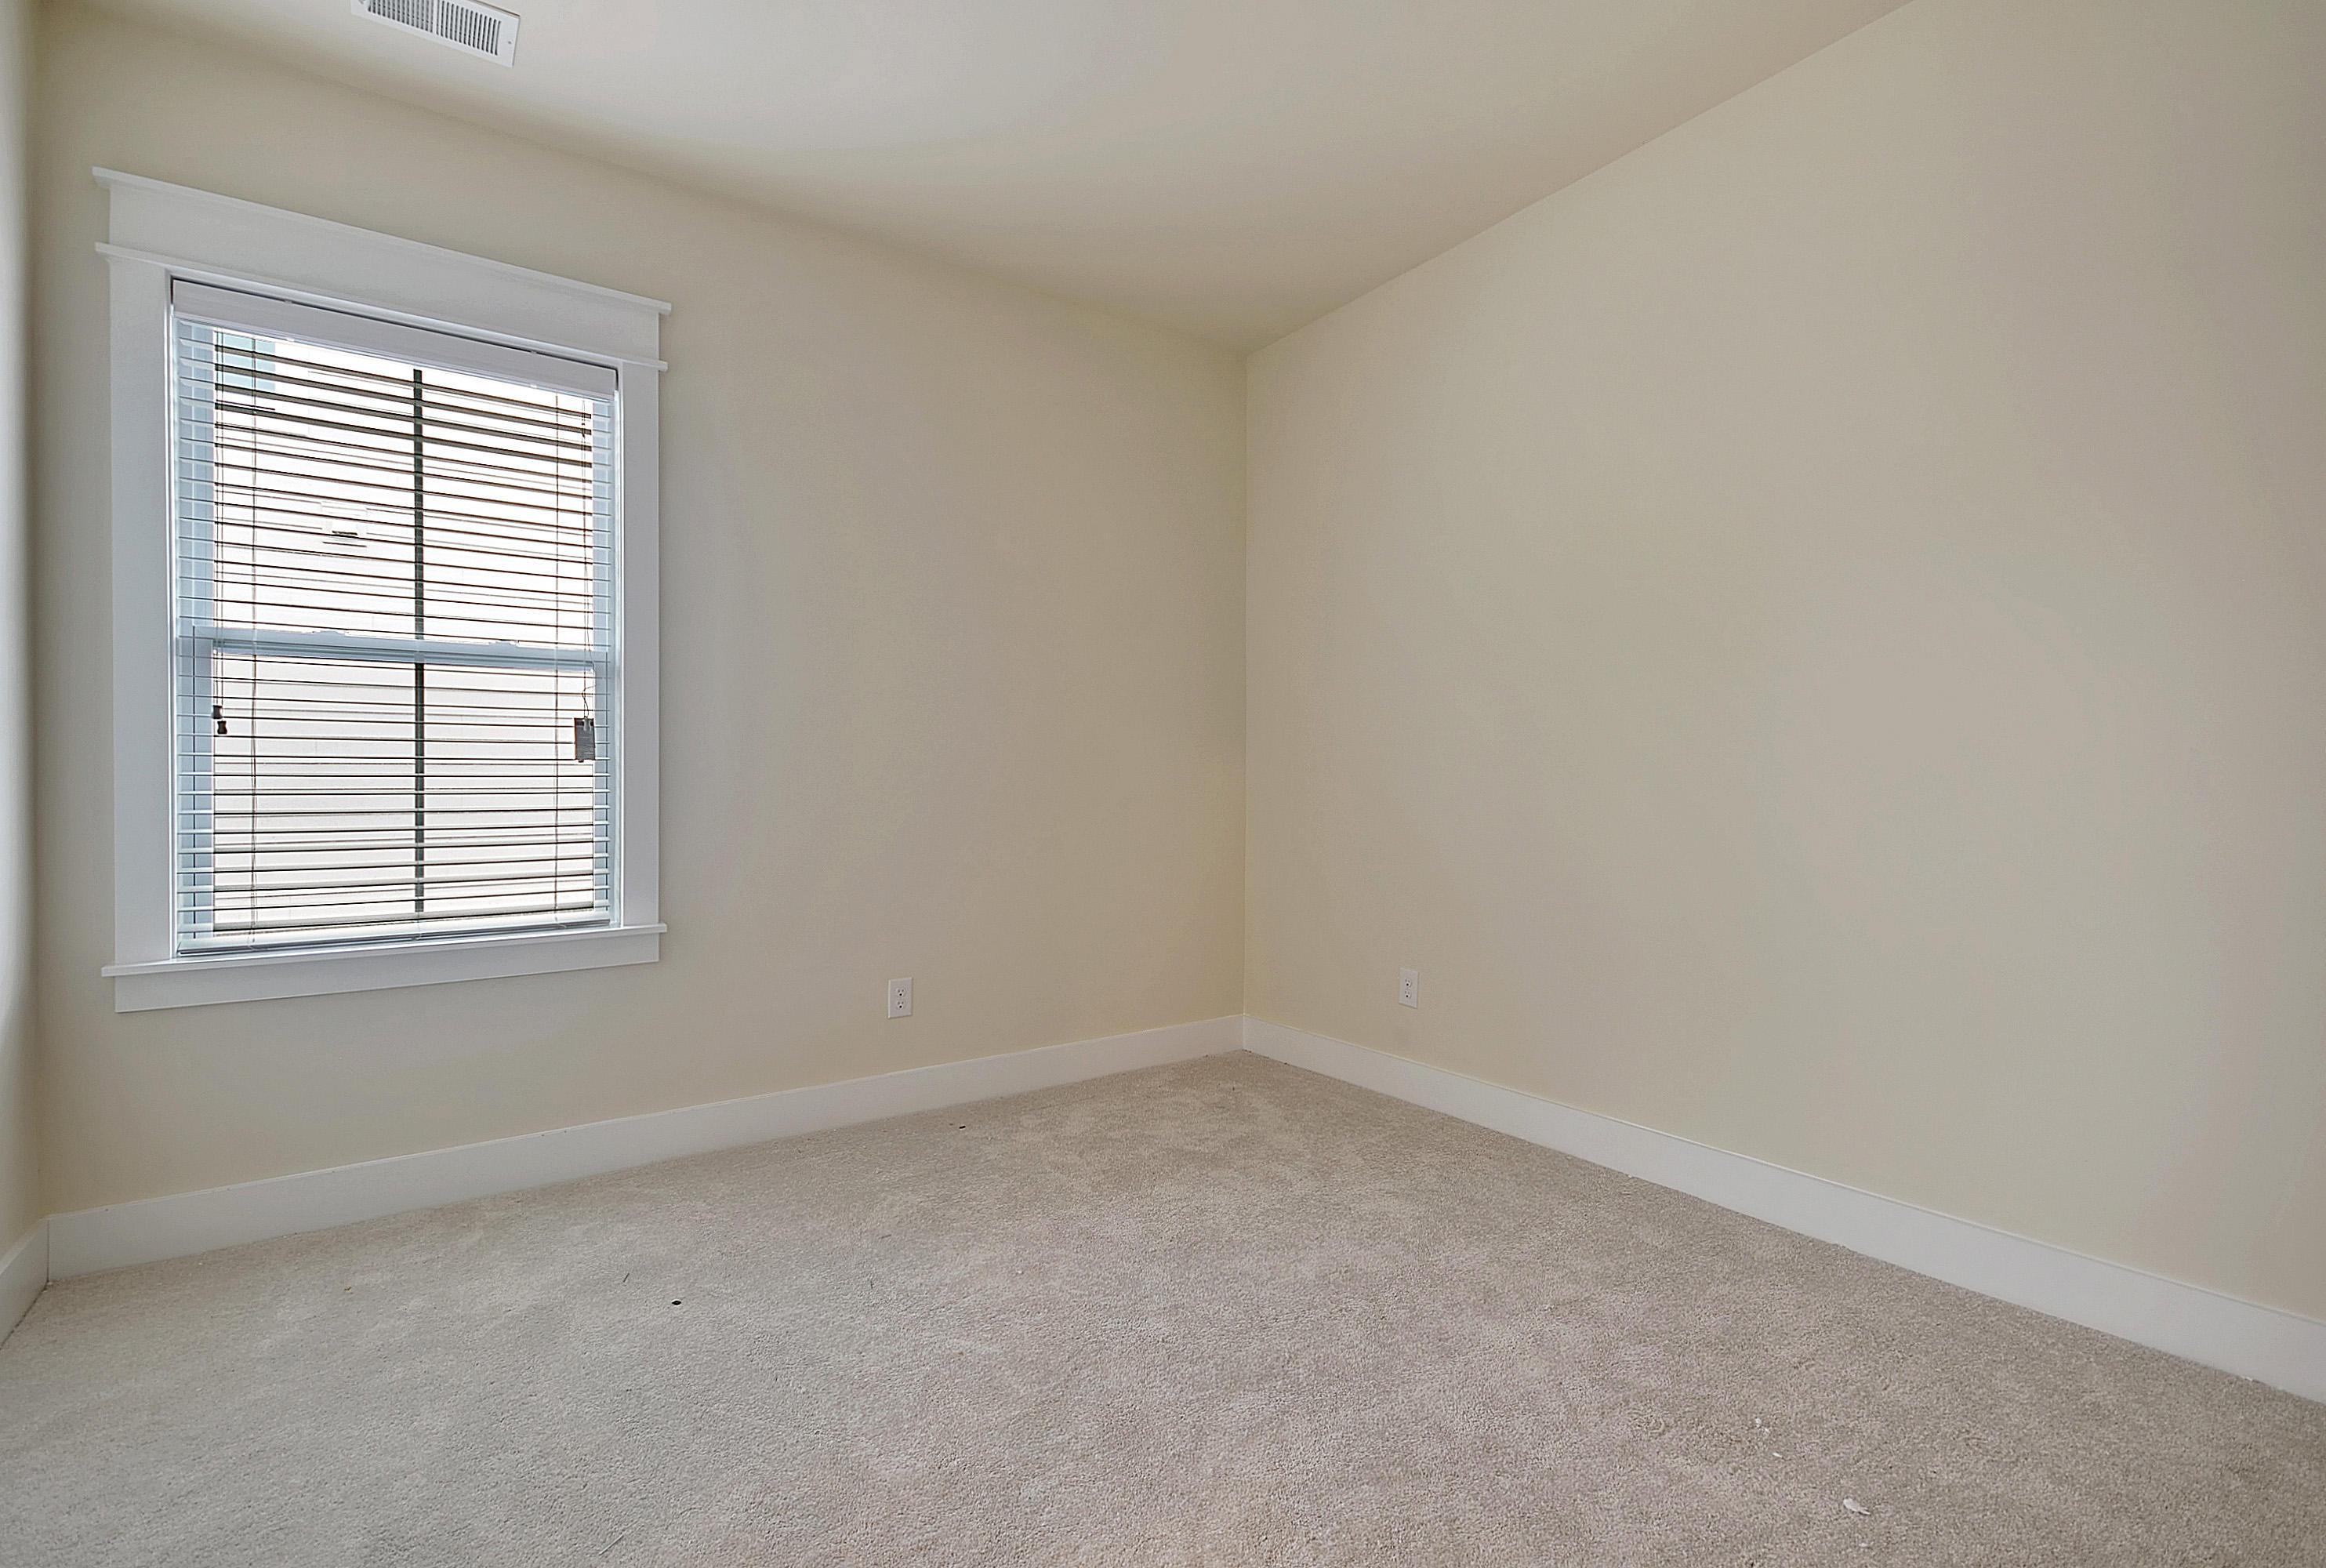 Park West Homes For Sale - 3945 Bessemer, Mount Pleasant, SC - 26